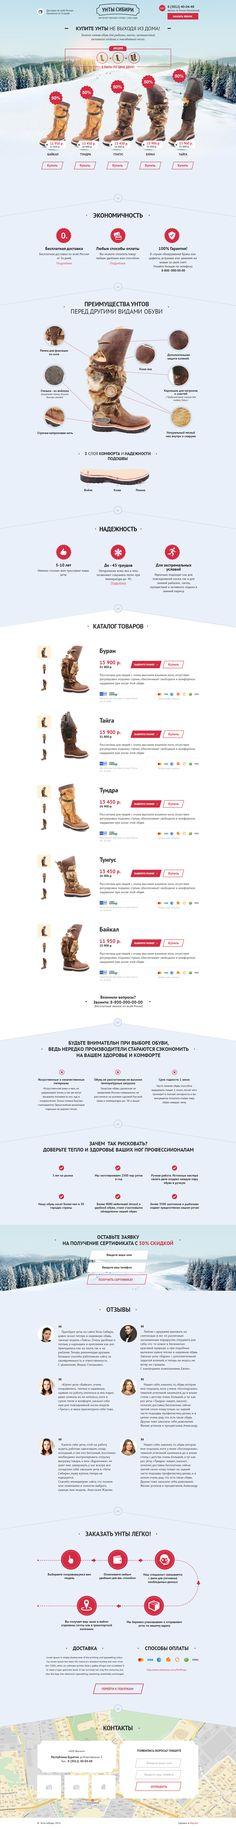 Unique Web Design, Boots Siberia #WebDesign #Design (http://www.pinterest.com/aldenchong/)